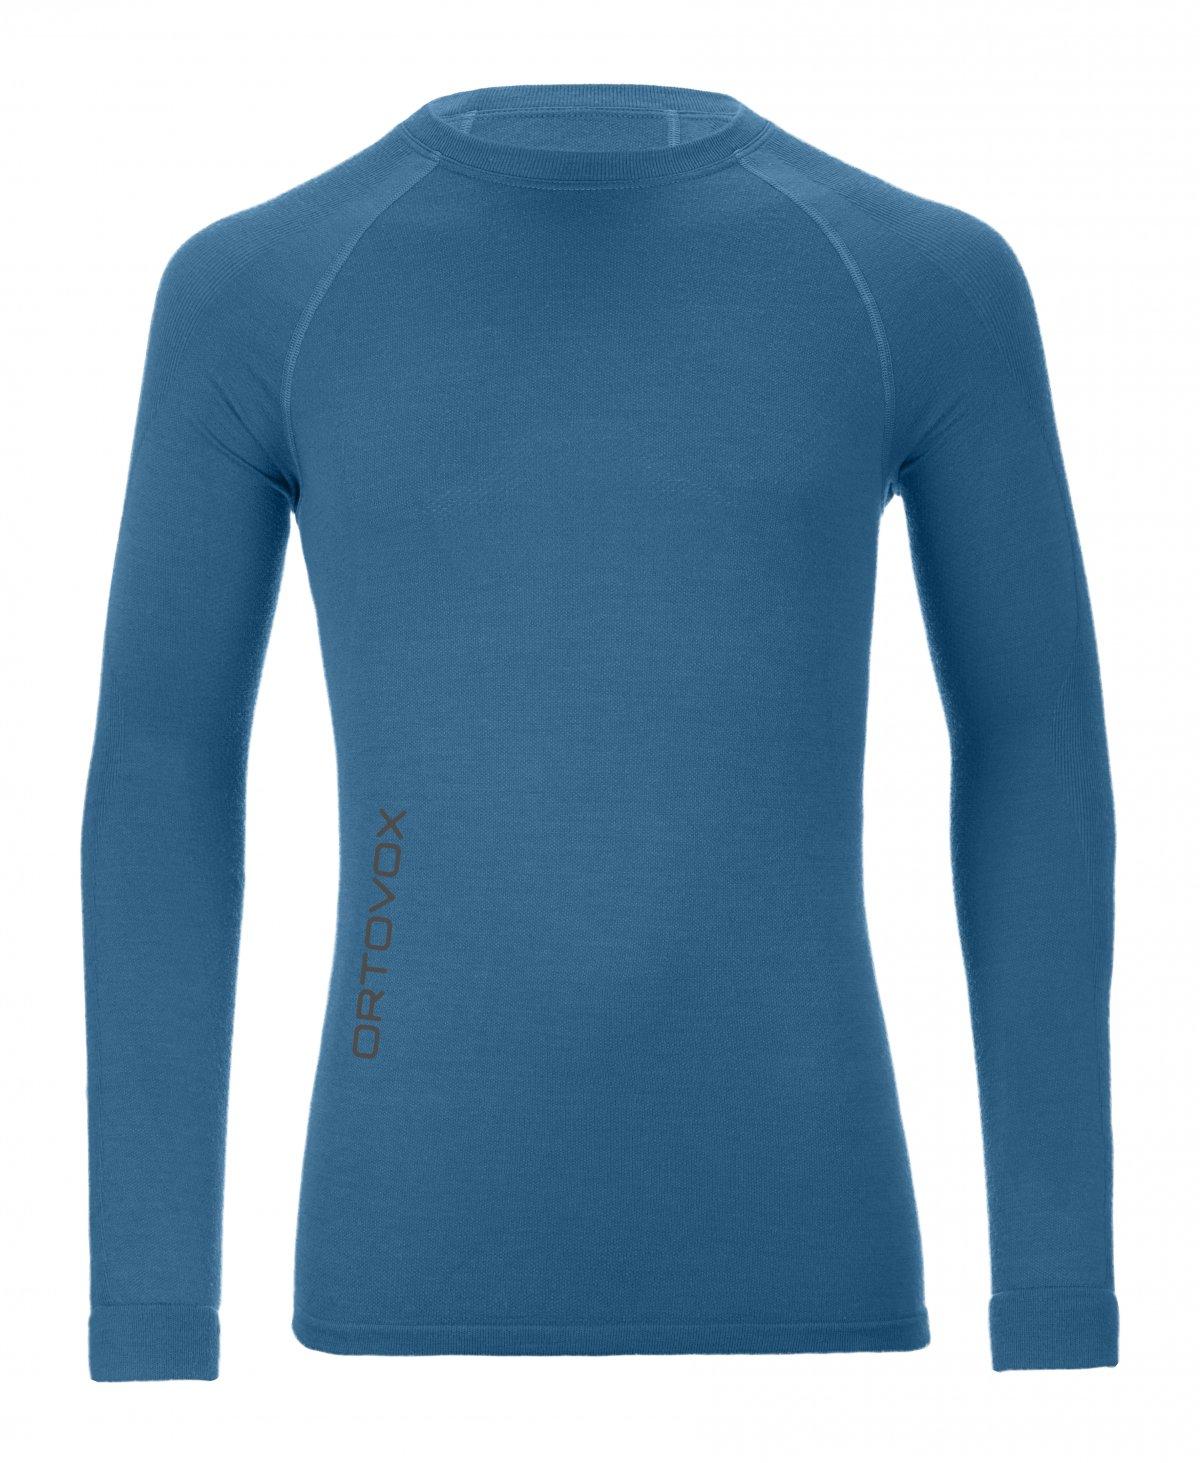 Ortovox - tričko Merino Competition Long Sleeve blue sea Velikost: XL